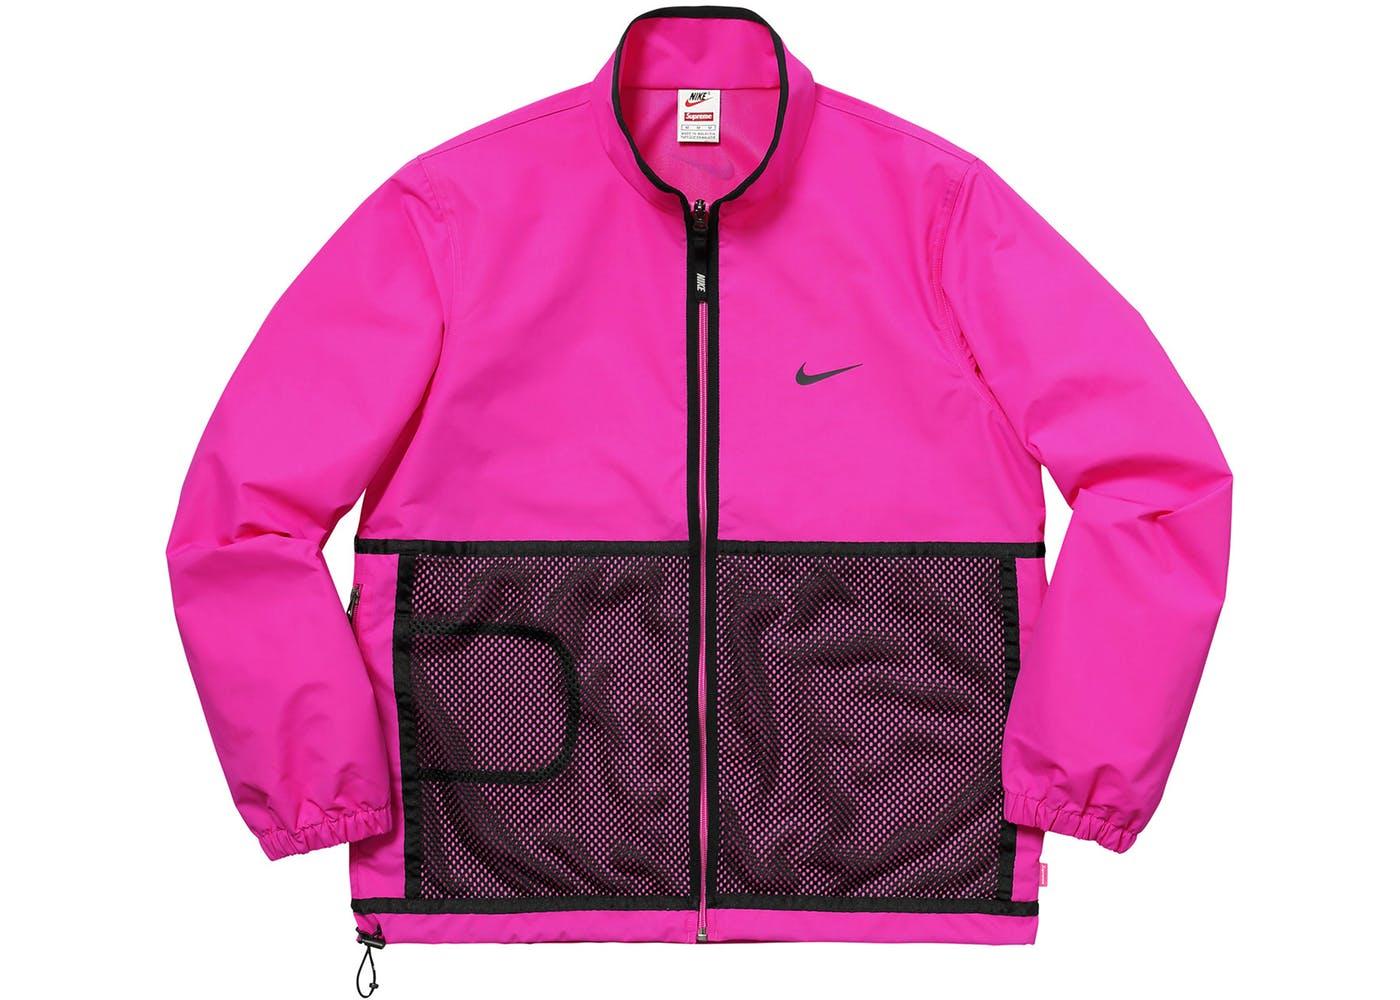 eso es todo Continuo Empuje hacia abajo  Supreme Nike Trail Running Jacket Pink - StockX News